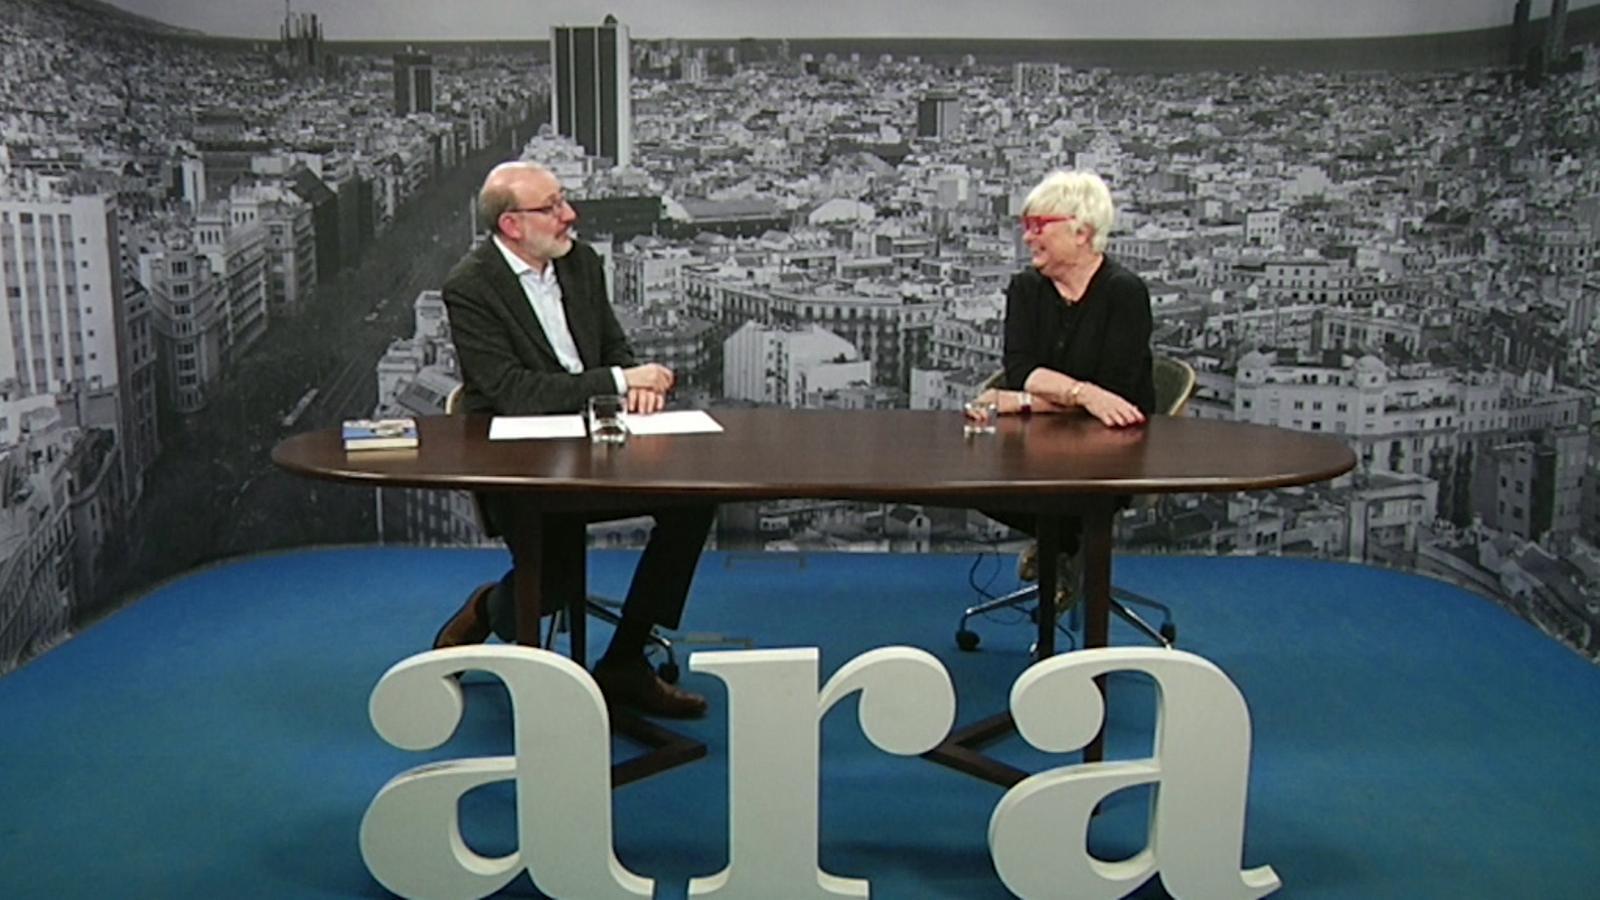 Entrevista d'Antoni Bassas a Marjolijn van der Meer